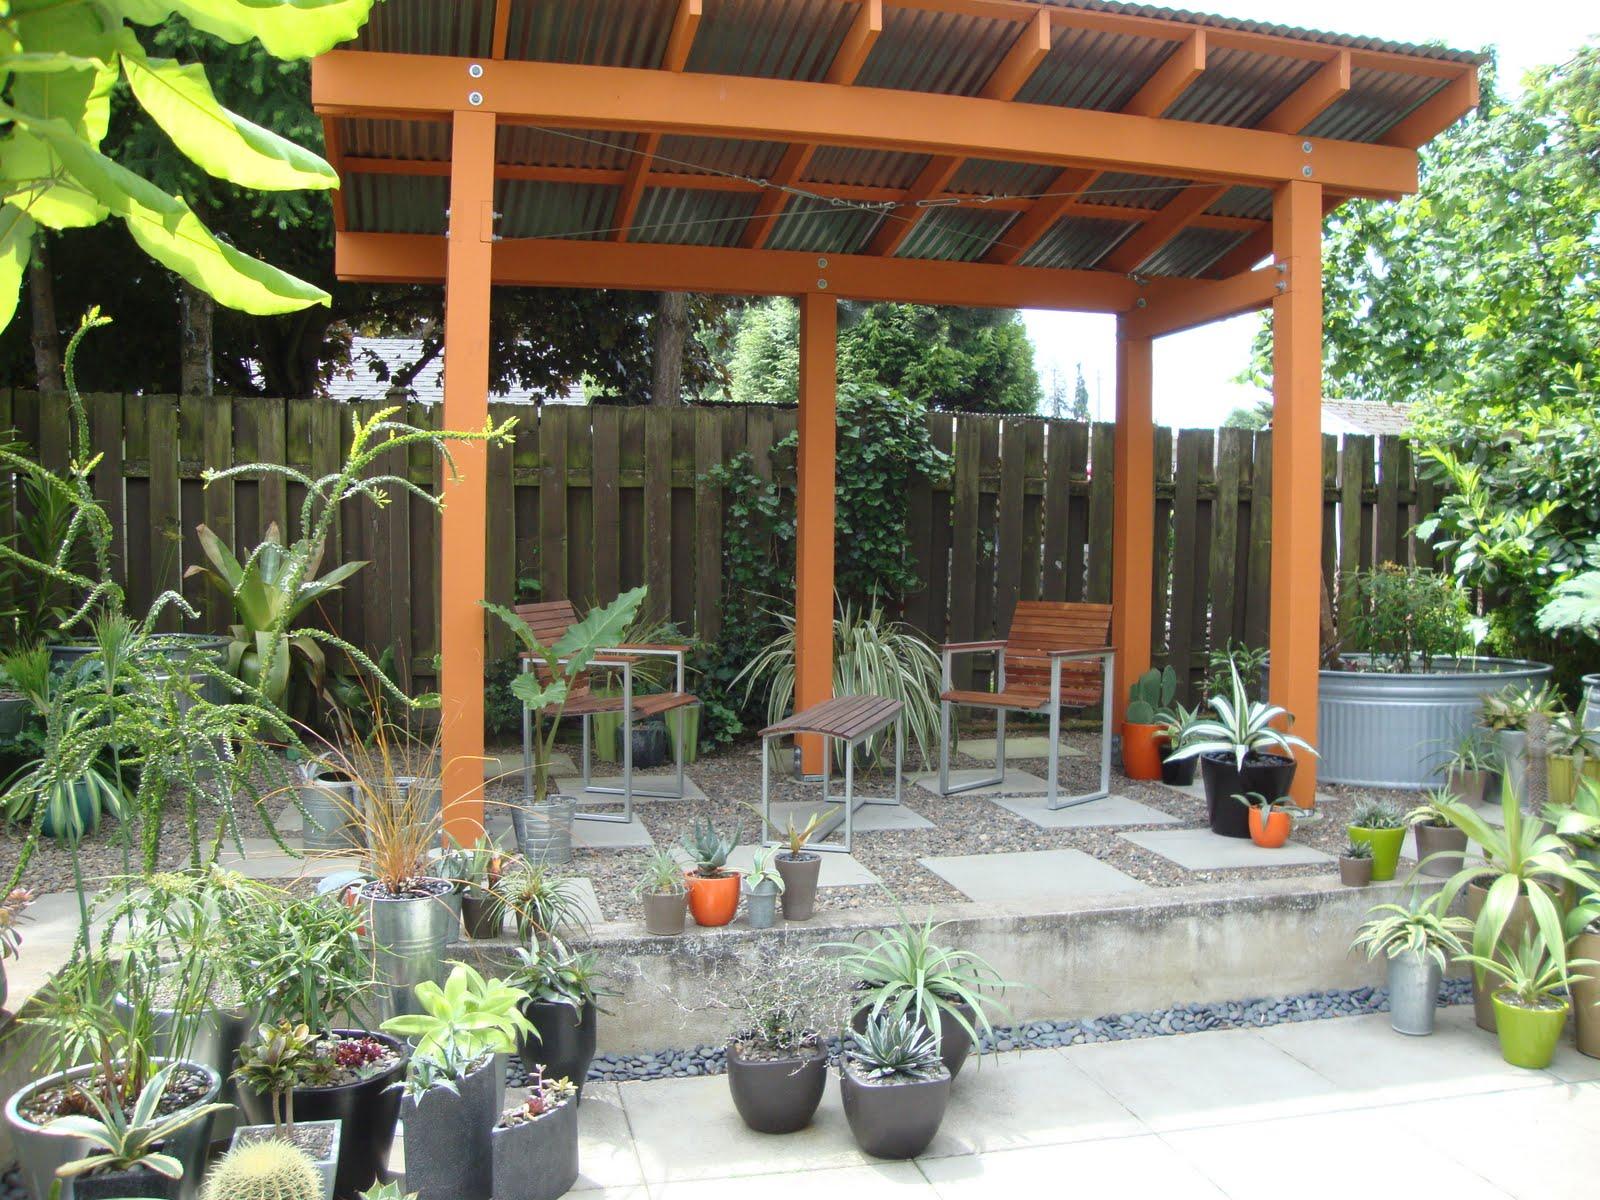 Danger Garden Overwintering Follow Up Report